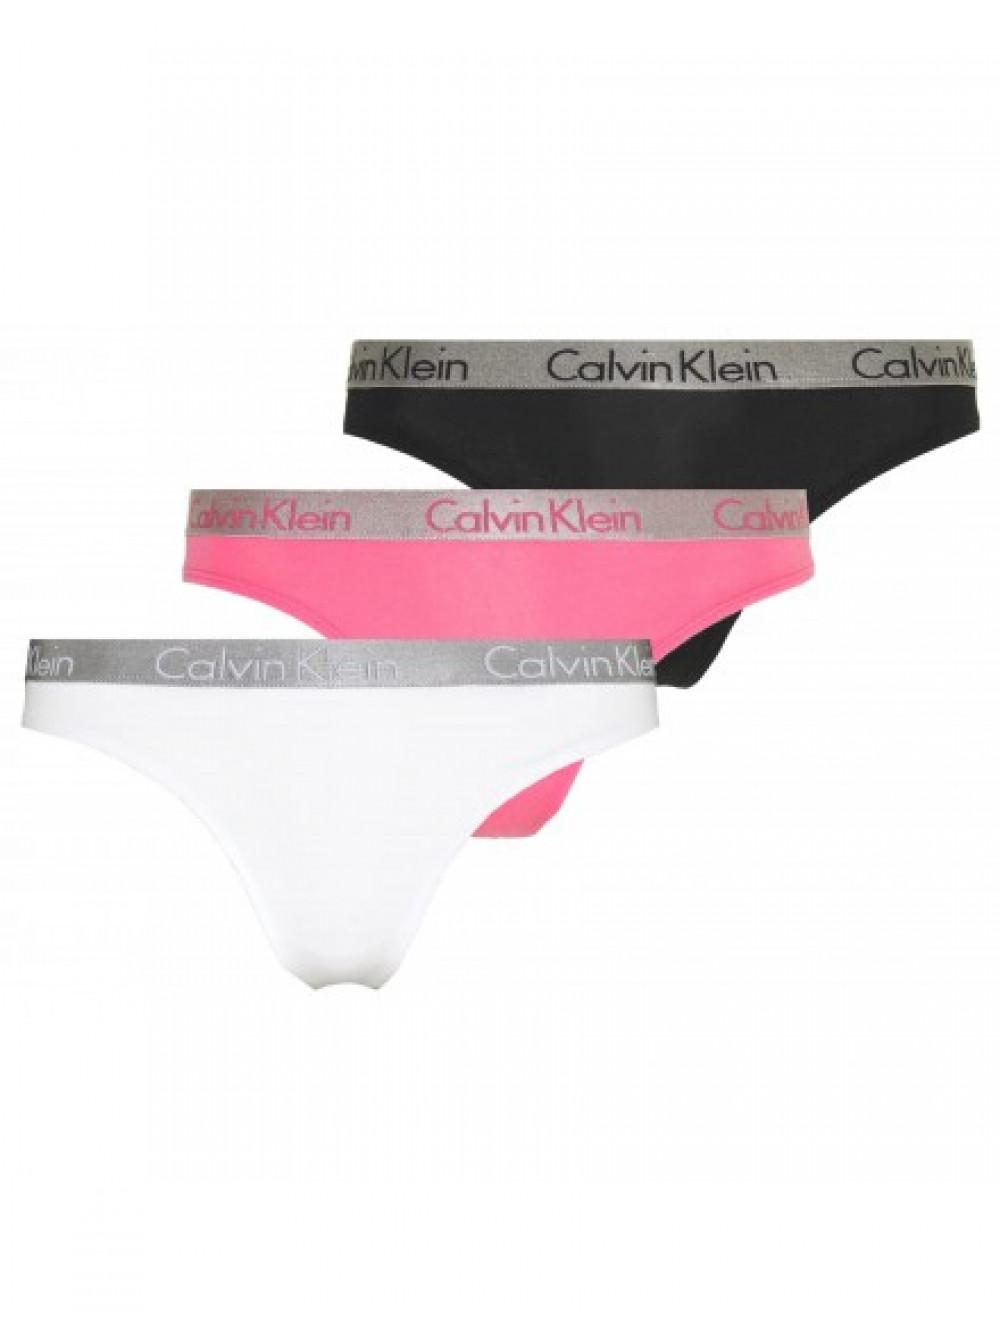 Dámske tangá Calvin Klein Radiant Cotton čierne, biele, ružové 3-pack